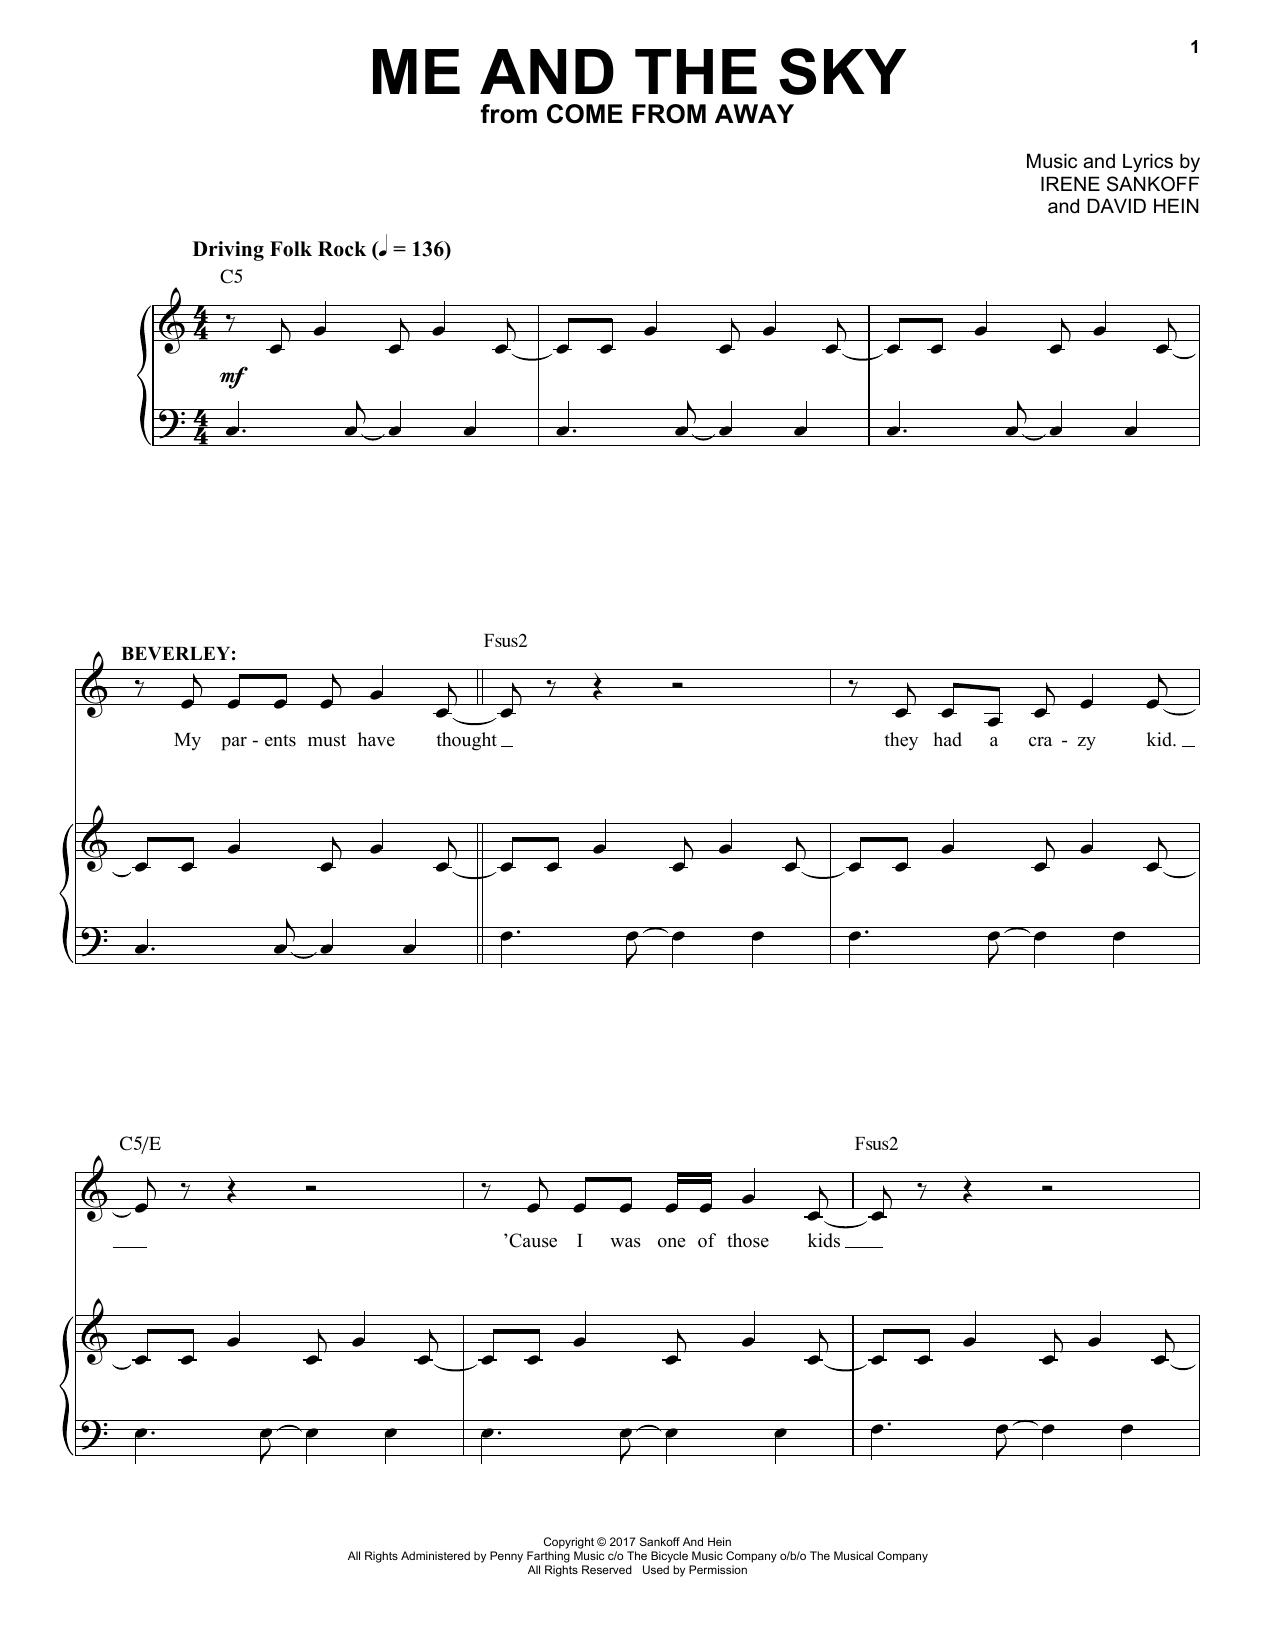 Sheet Music Digital Files To Print - Licensed Irene Sankoff Digital